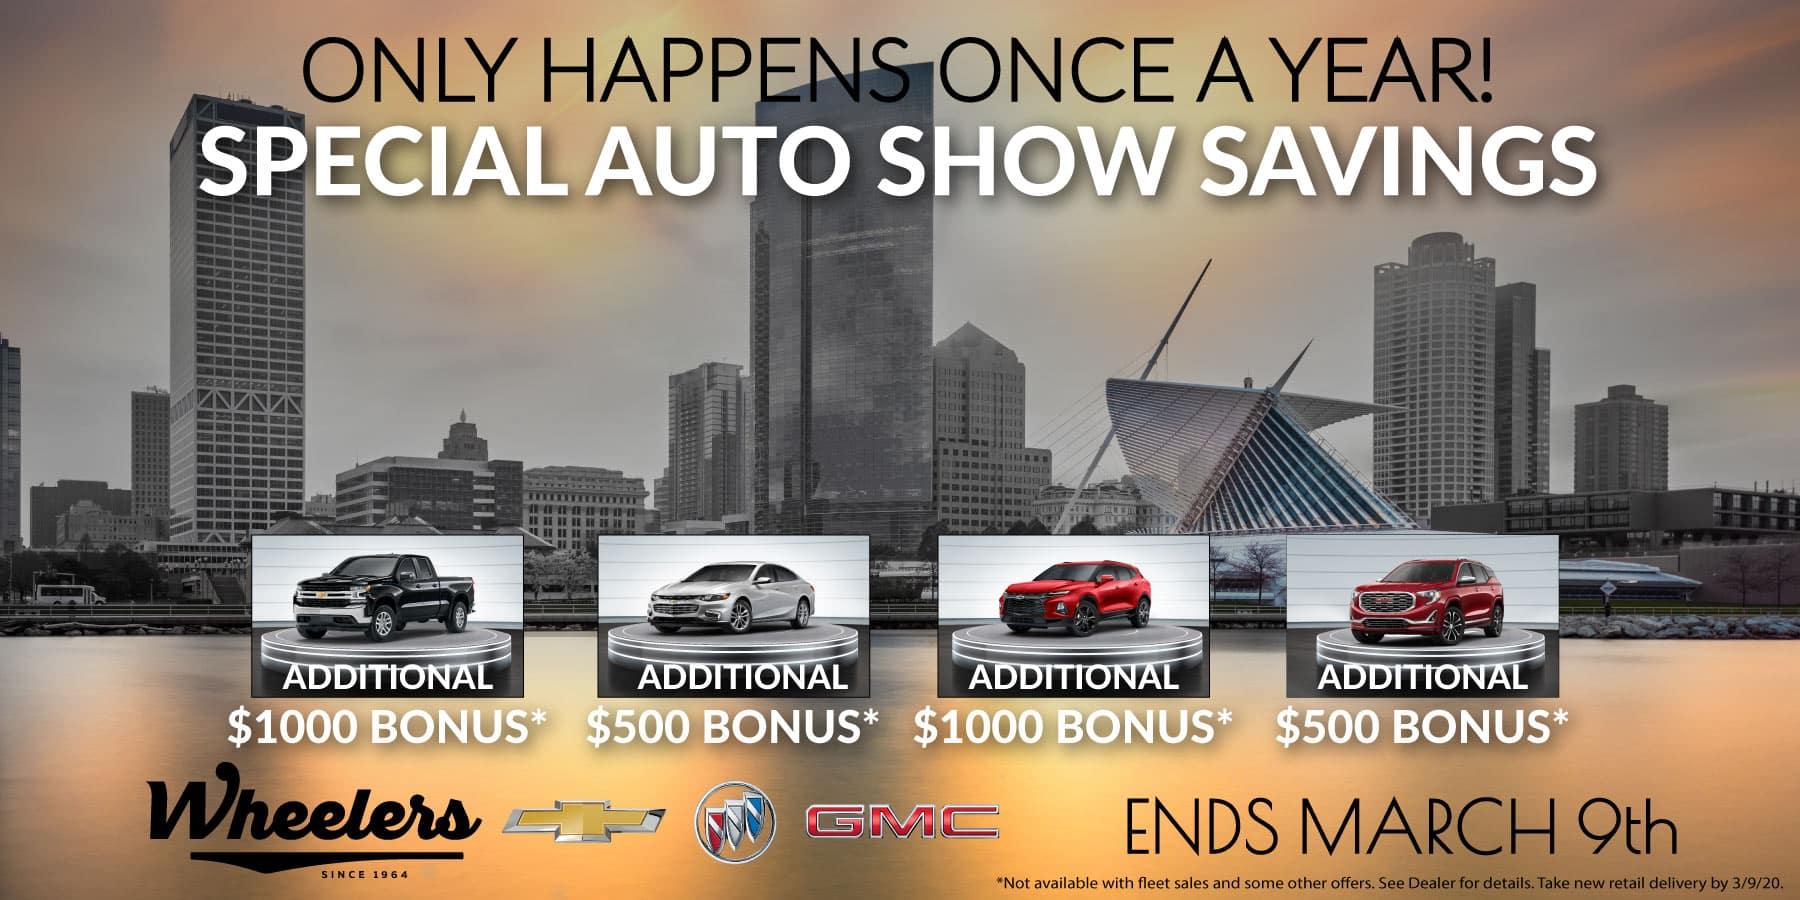 2020 Auto Show Special Savings Offer